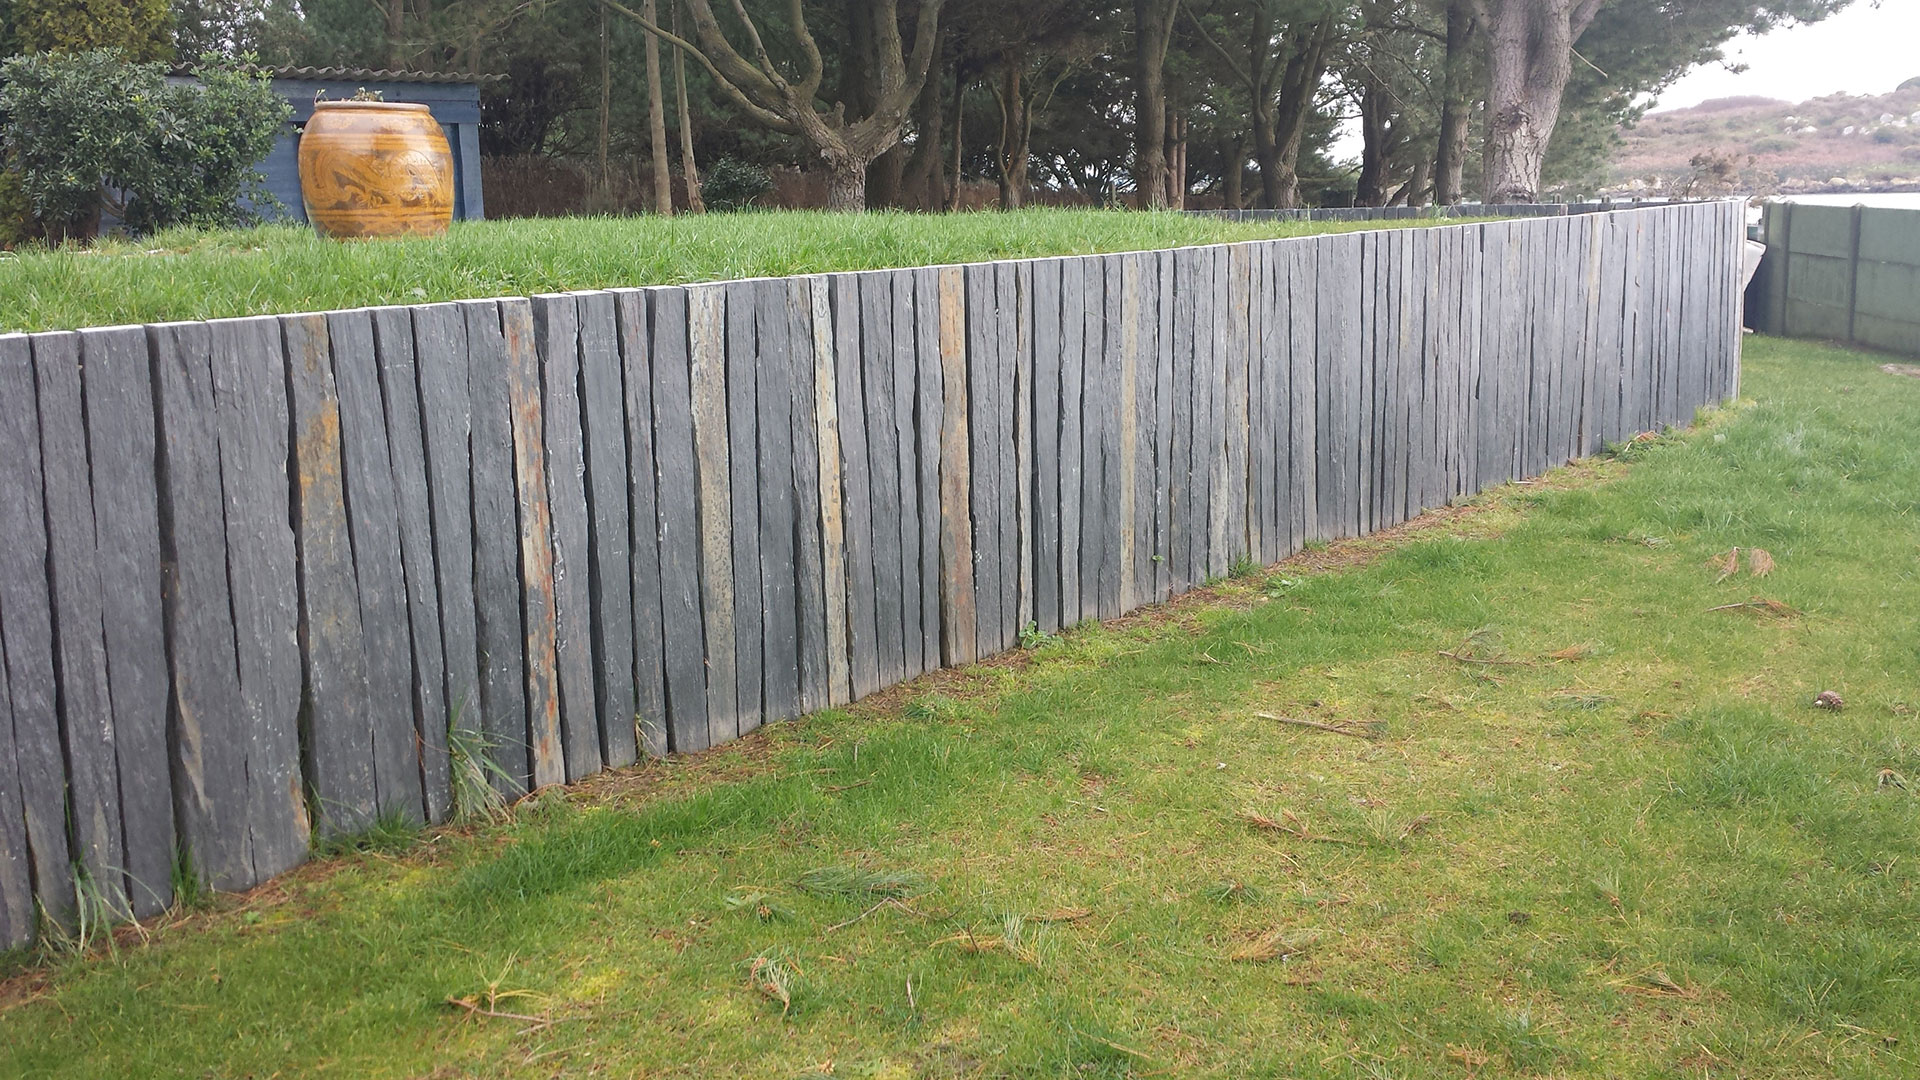 D co cabane de jardin sur mesure grenoble 12 cabane de jardin en bois pas cher cabane dans - Cabane de jardin grenoble ...